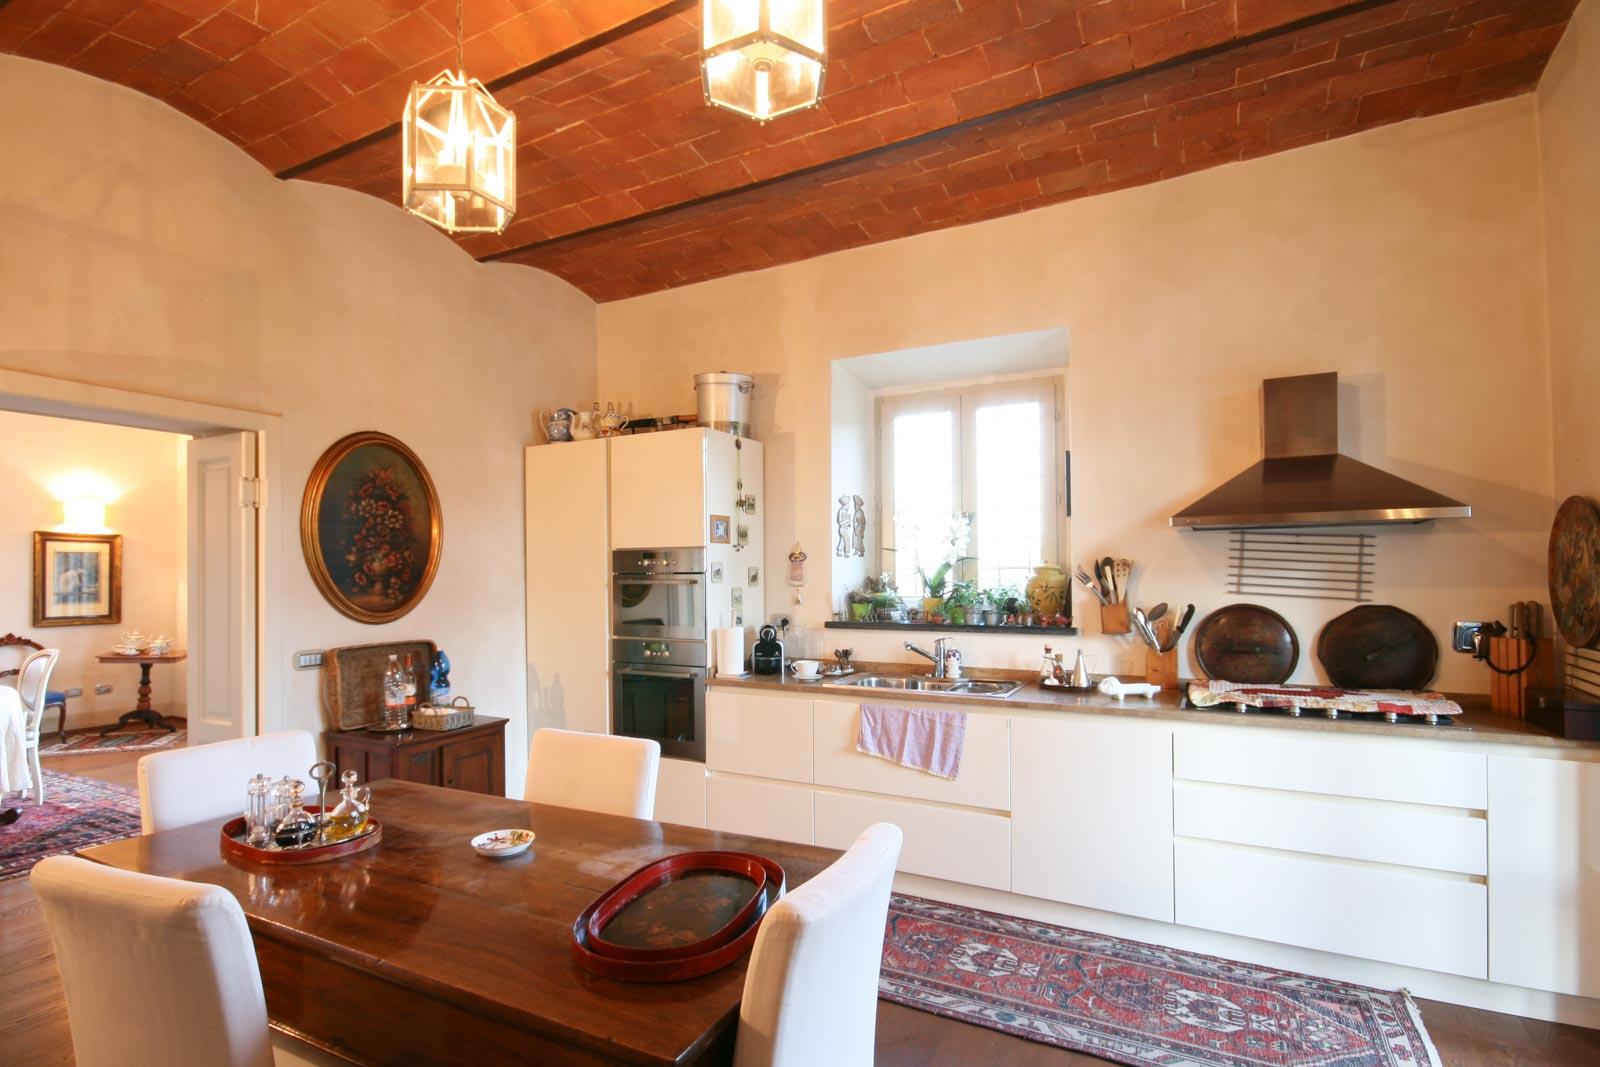 Landsitz Kaufen Verkaufen In Italien Toskana Livorno Rosignano